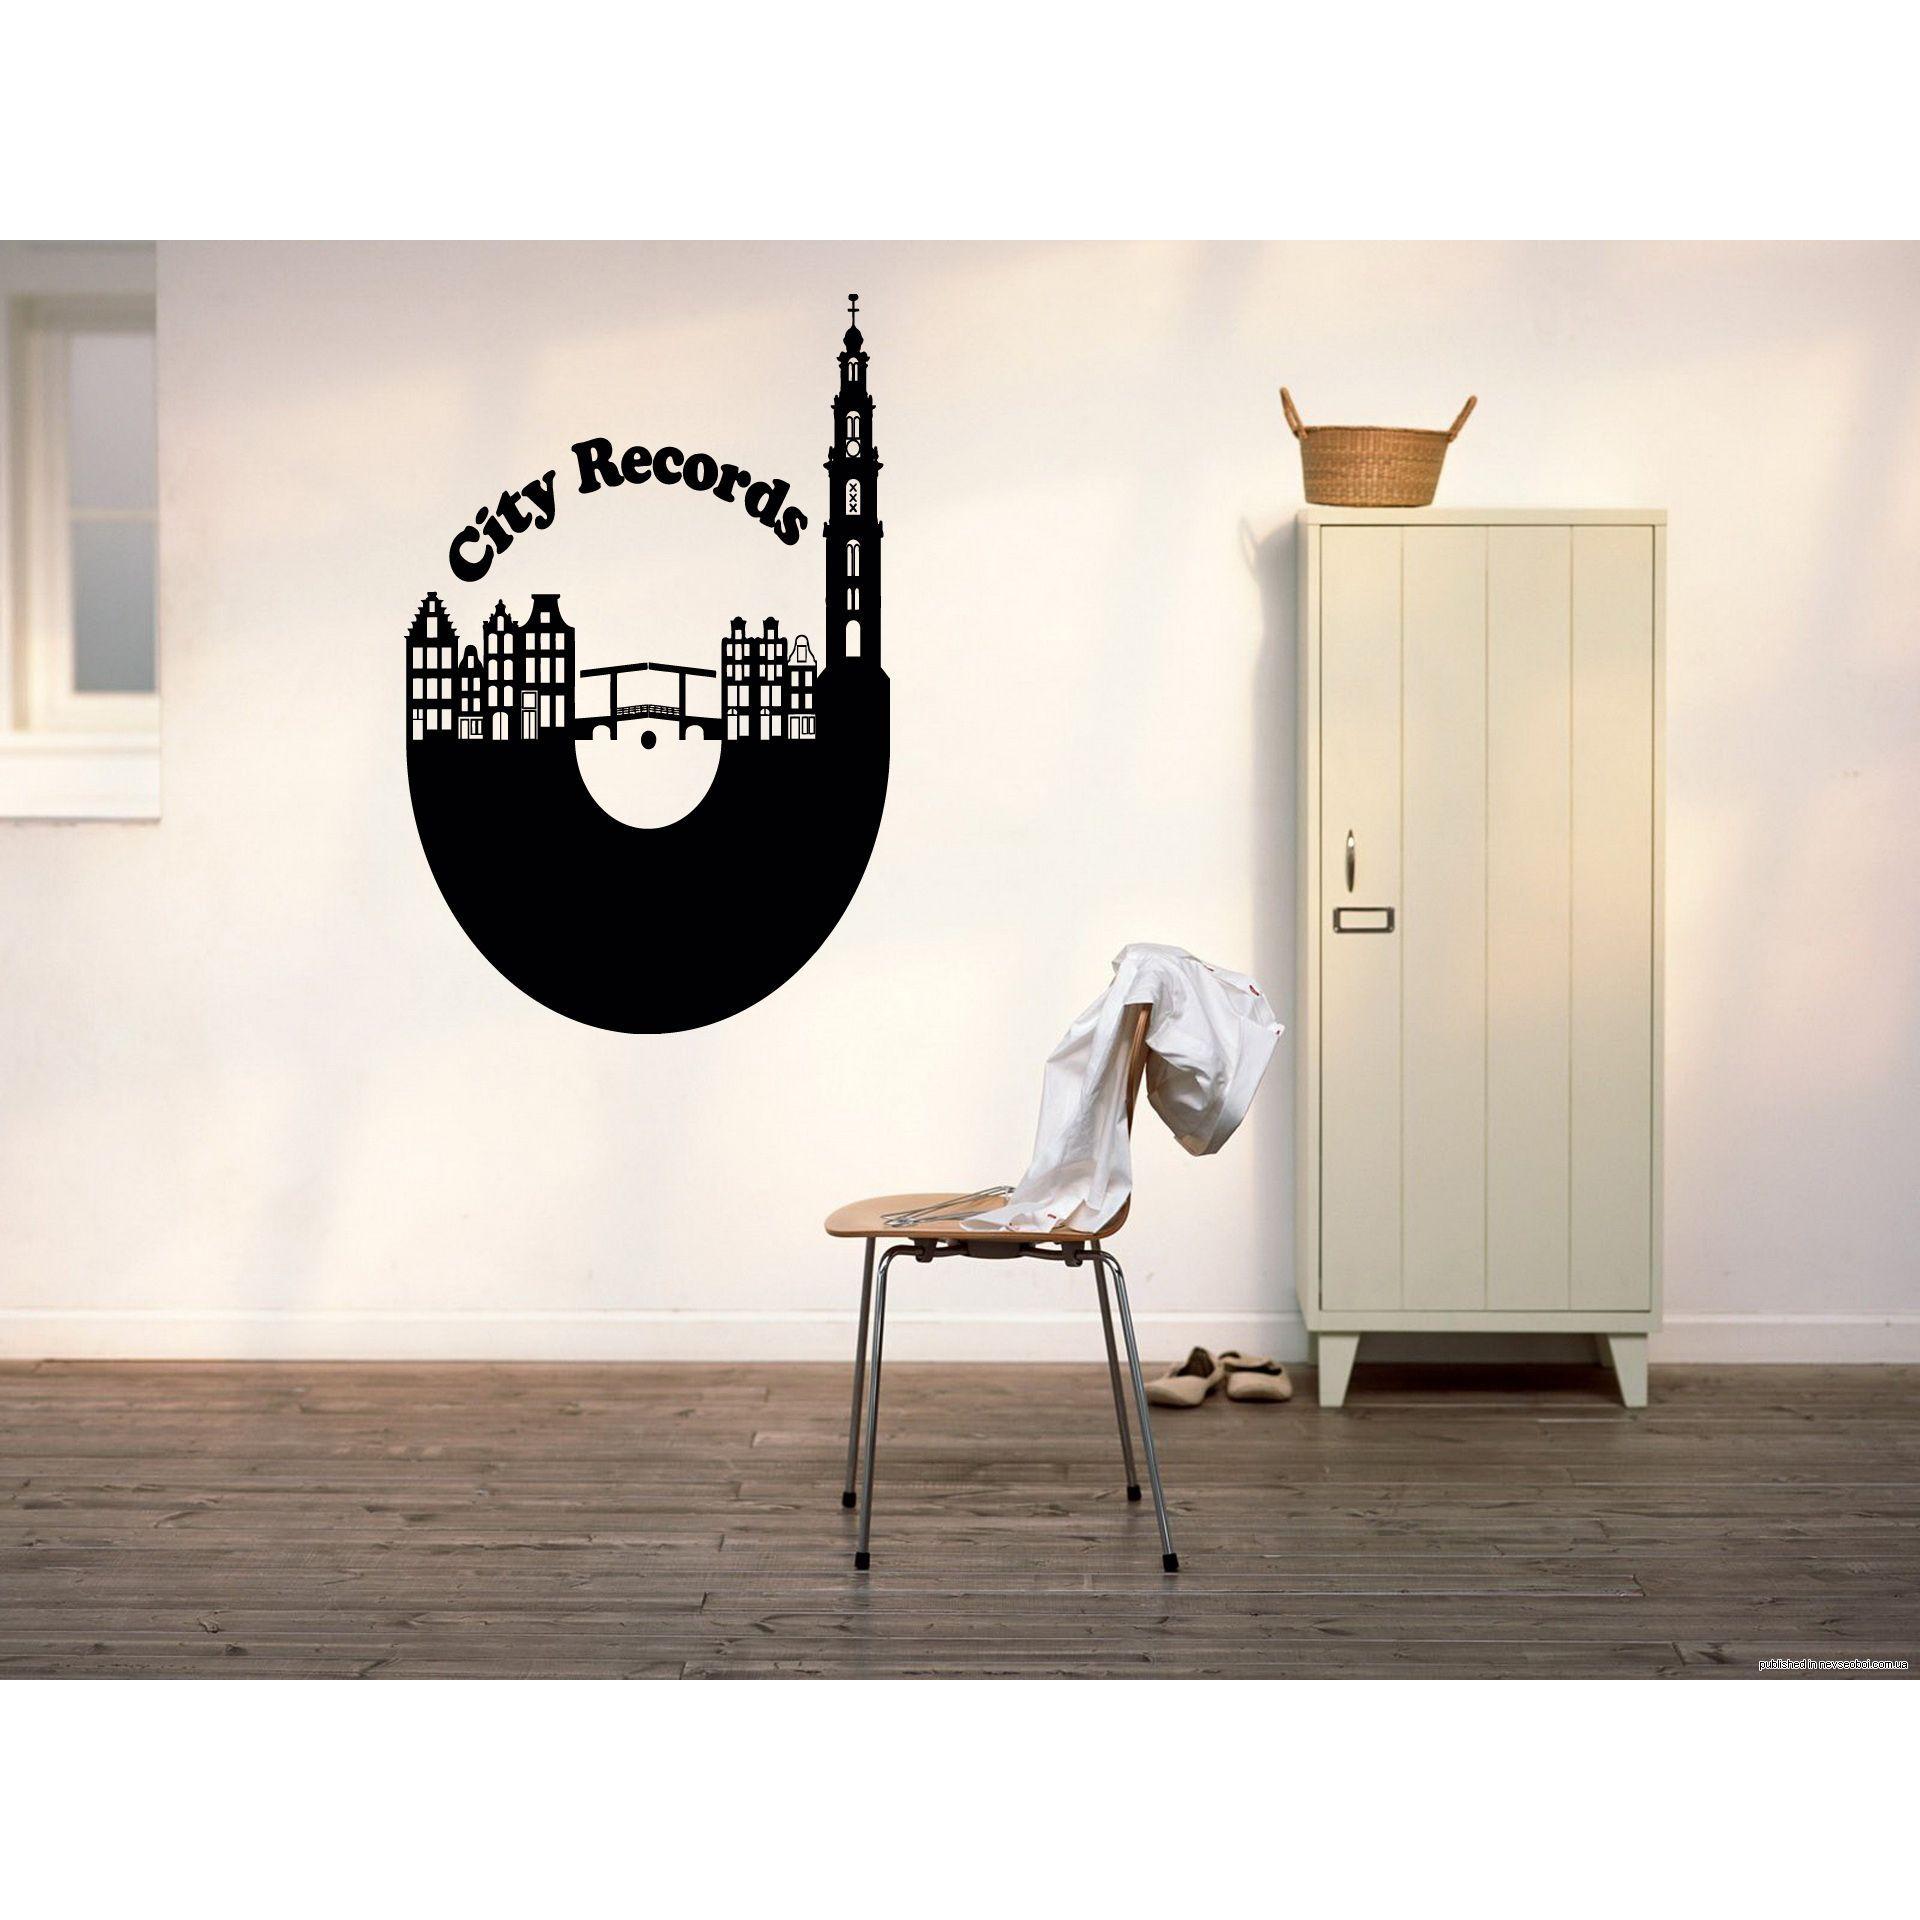 Amsterdam city Records Wall Art Sticker Decal